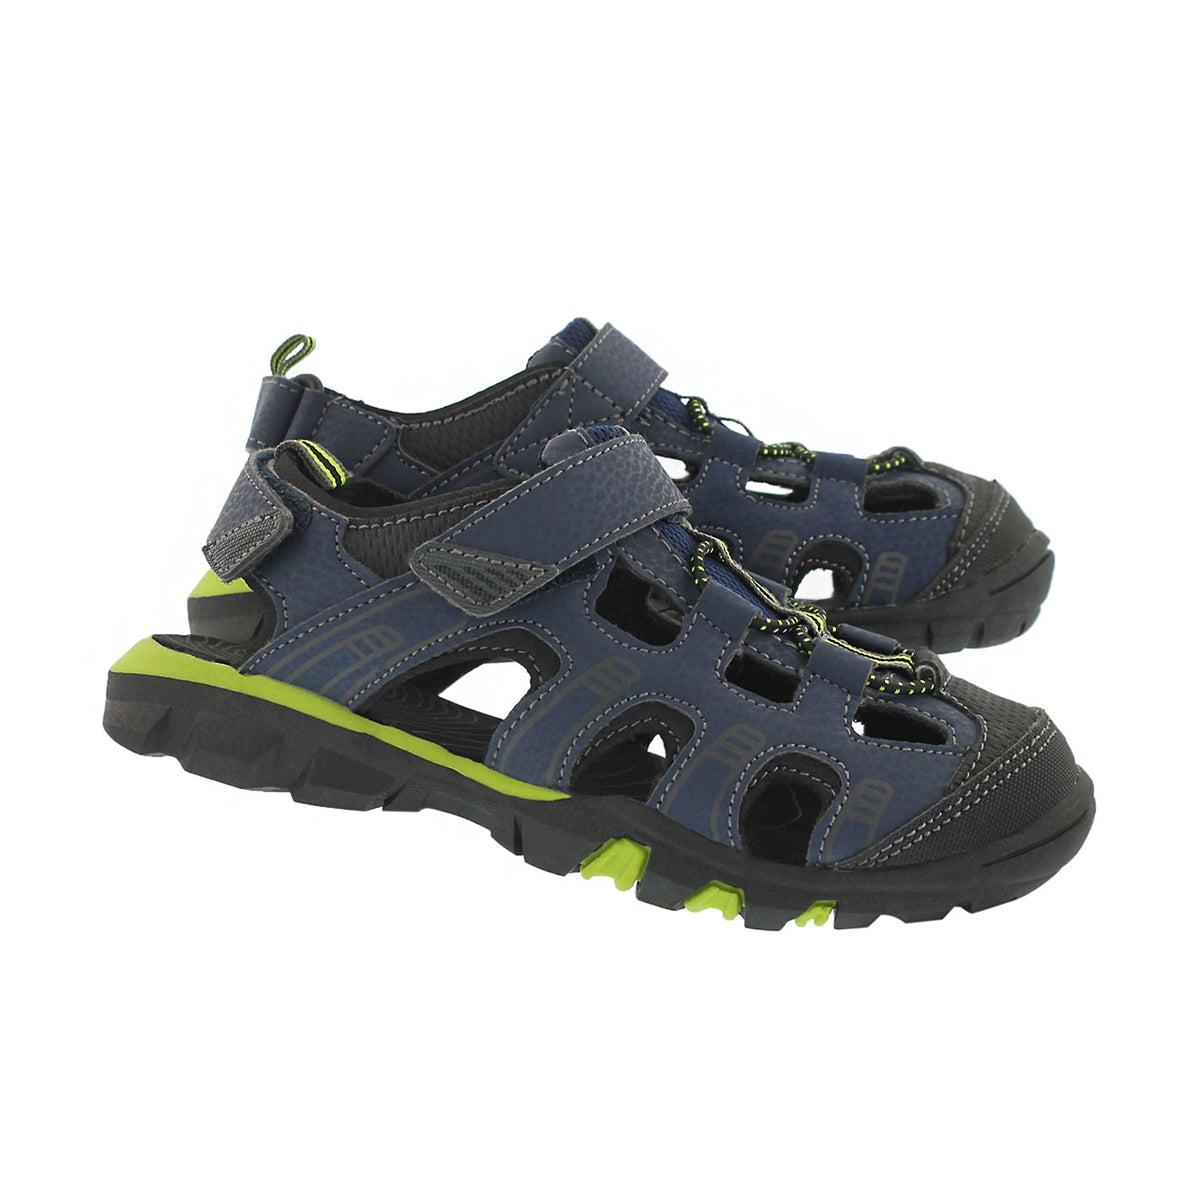 Bys Elliot 2 navy closed toe sandal